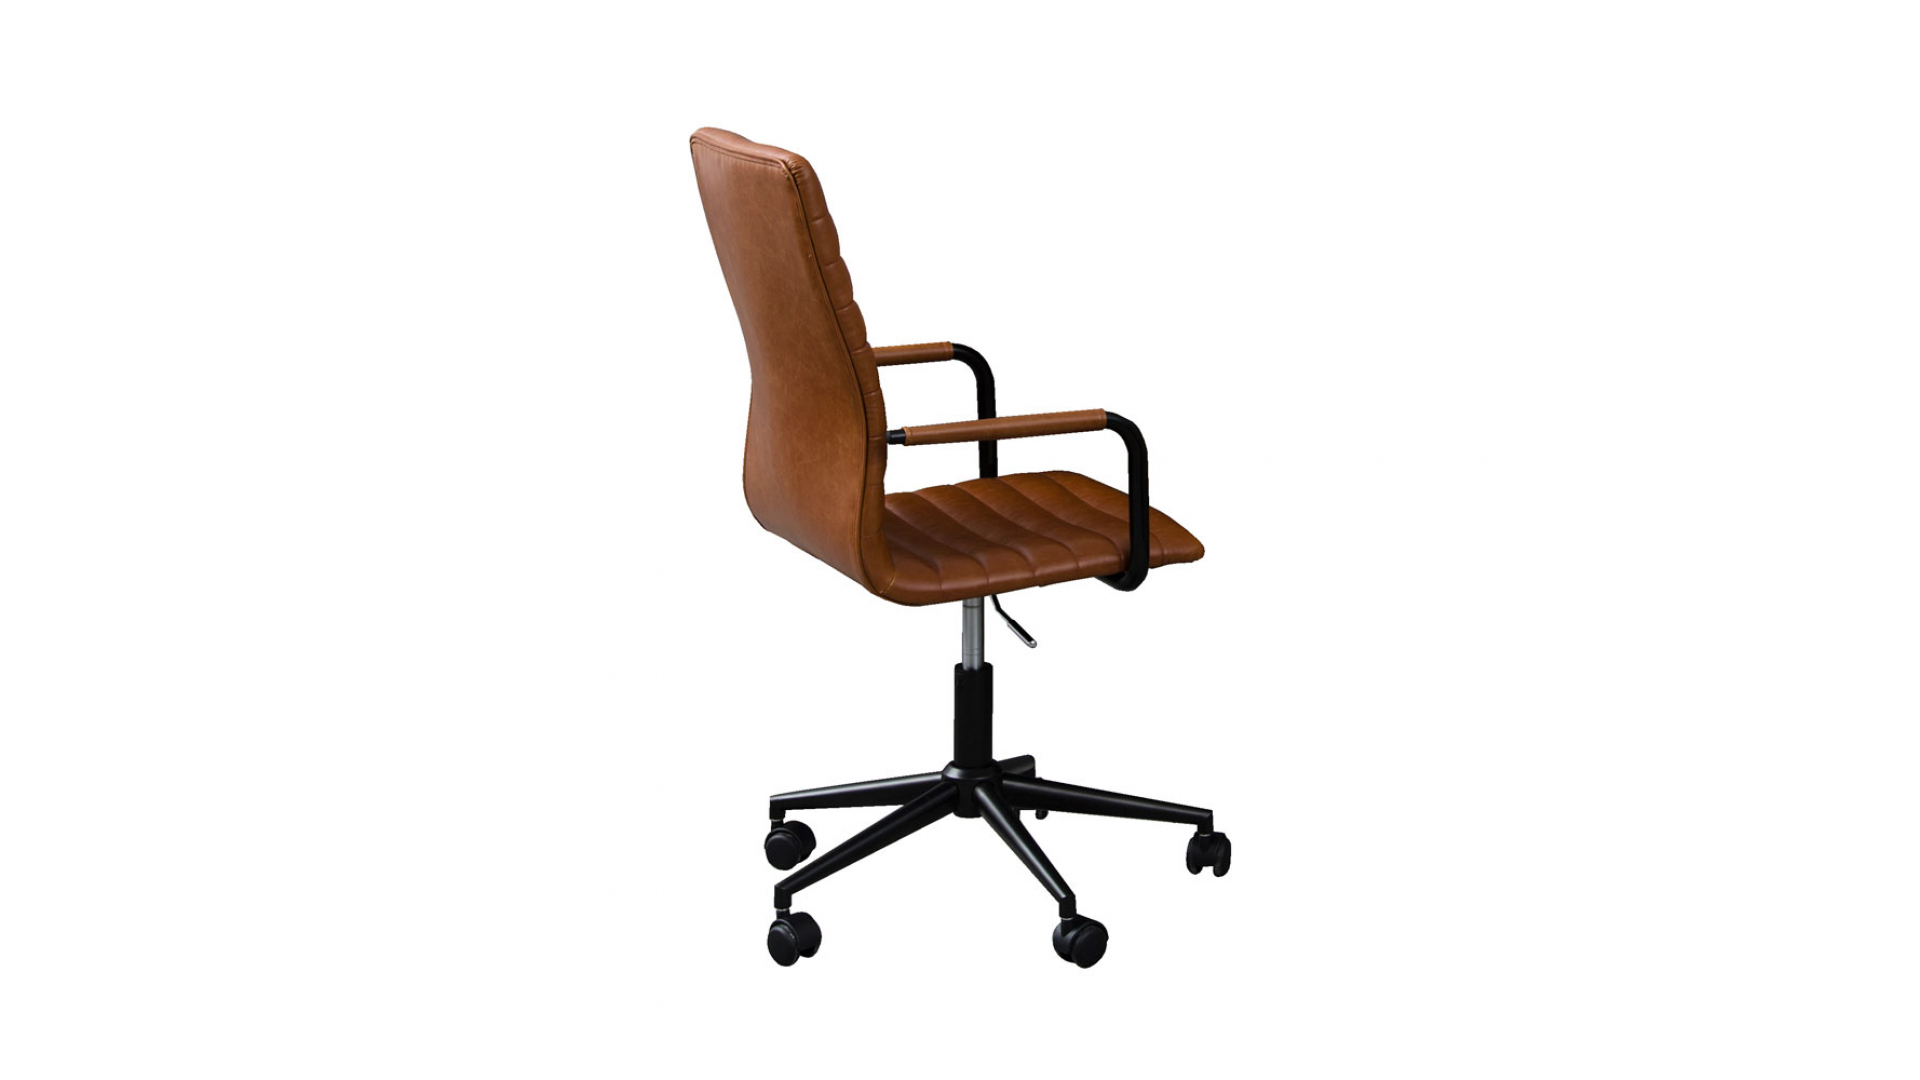 Vintage Design Bureaustoel.Bureaustoel Winslow Leather Look Vintage Brandy Bruin Deba